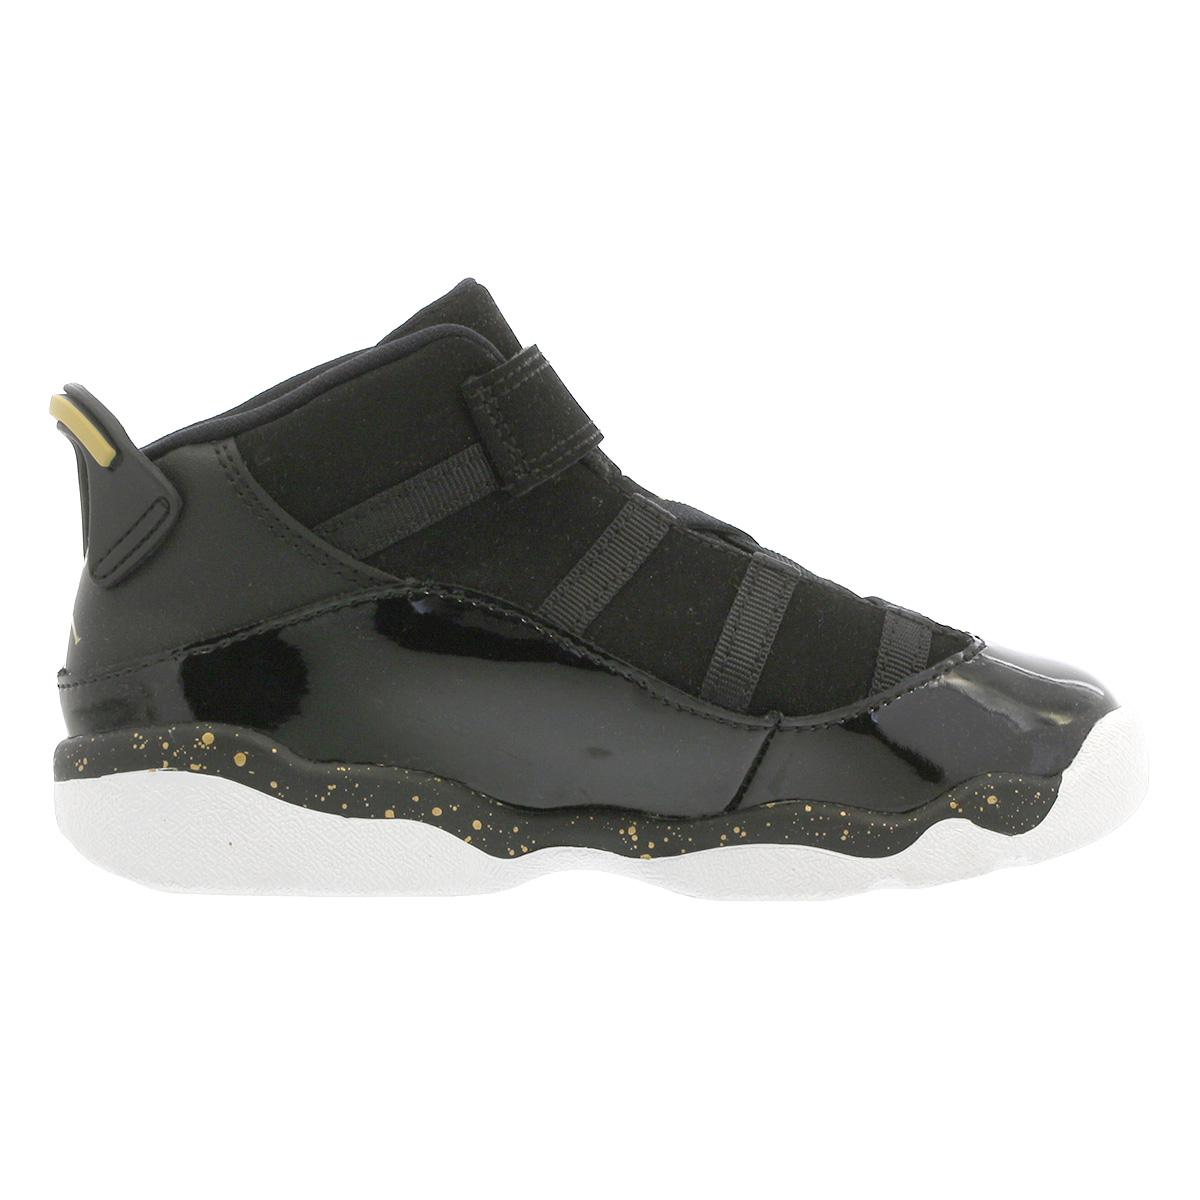 pretty nice ad5f9 52499 NIKE JORDAN 6 RINGS TD Nike Jordan 6 RINGS Co.,Ltd. TD BLACK/METALLIC  GOLD/WHITE 323,420-007